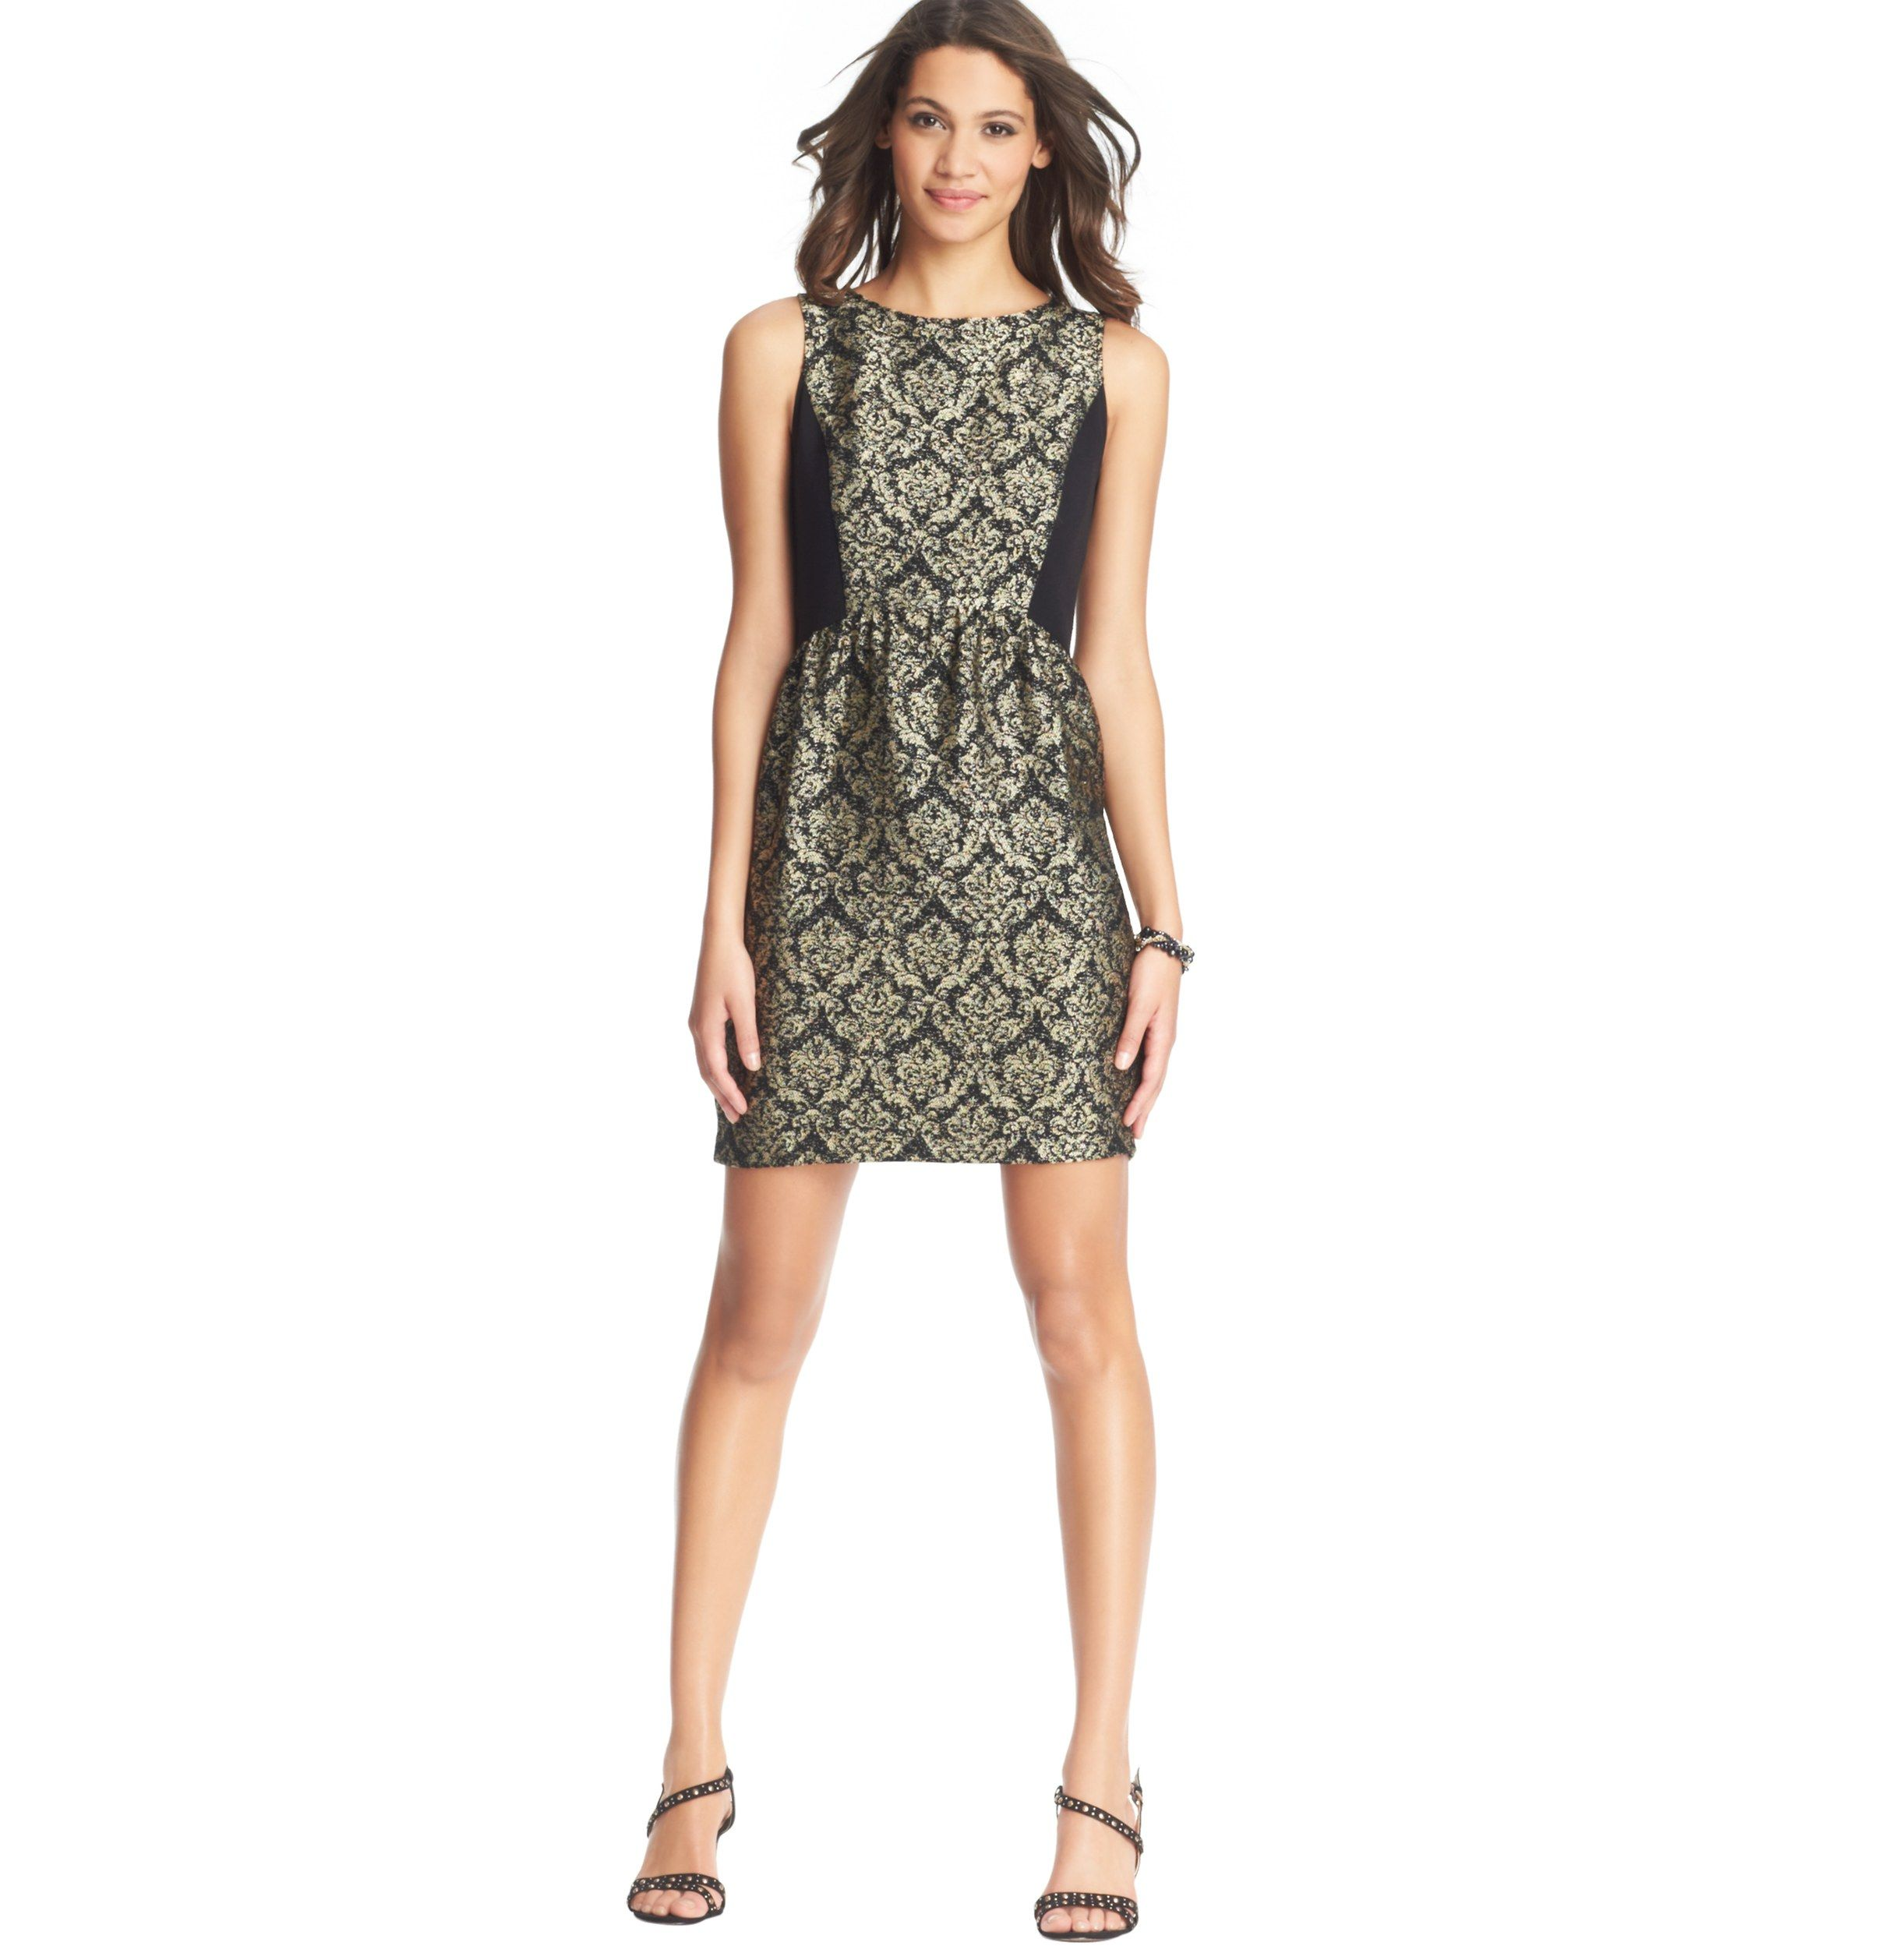 Colorblocked Jacquard Sleeveless Dress | Loft | Holiday Attire ...